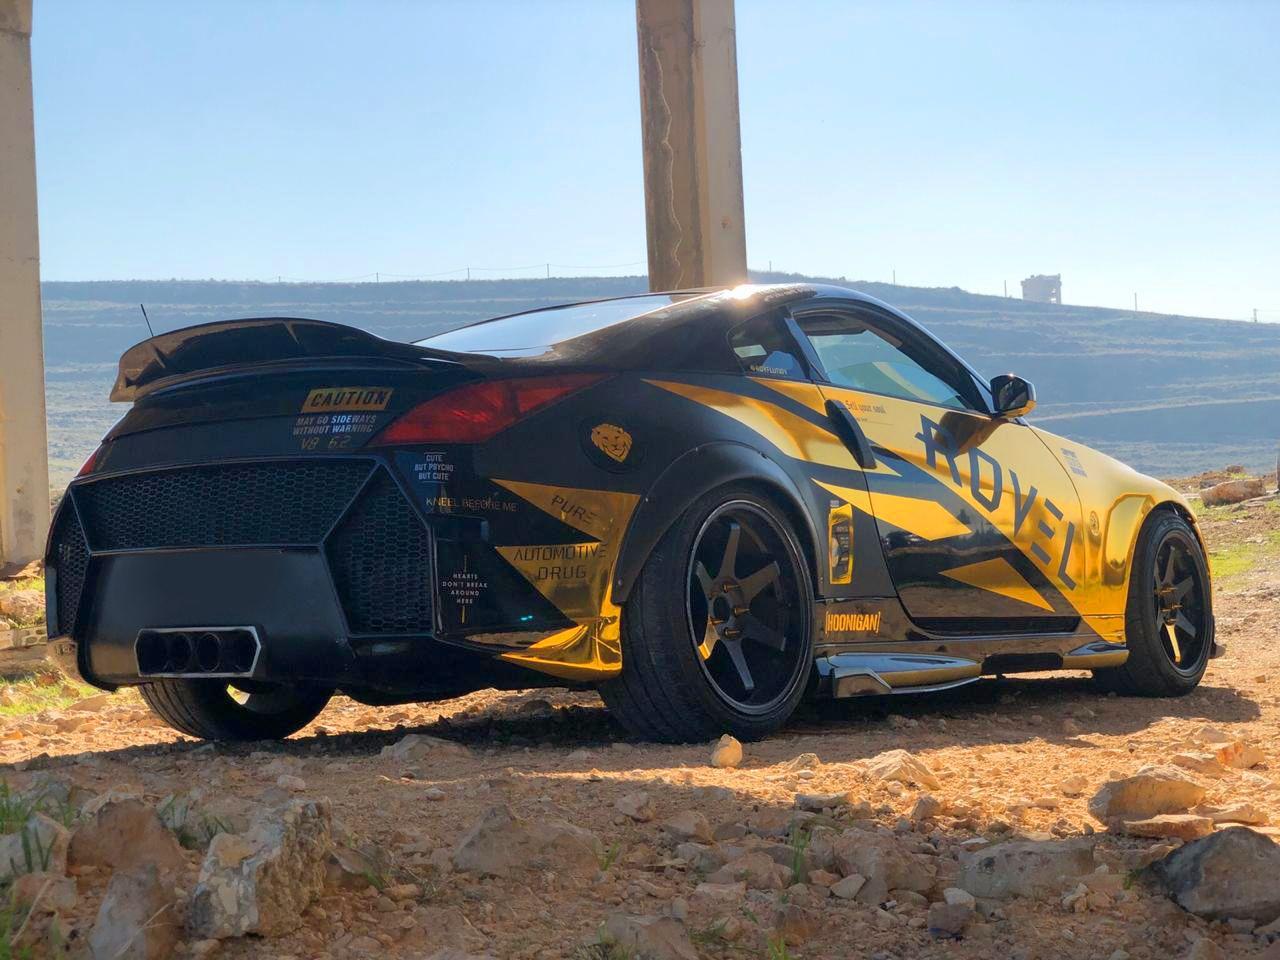 rovel 350Z drifting gold chrome car design #drift #driftcar #racingcar #goldchrome #cardesign #carwrap #goldandblack